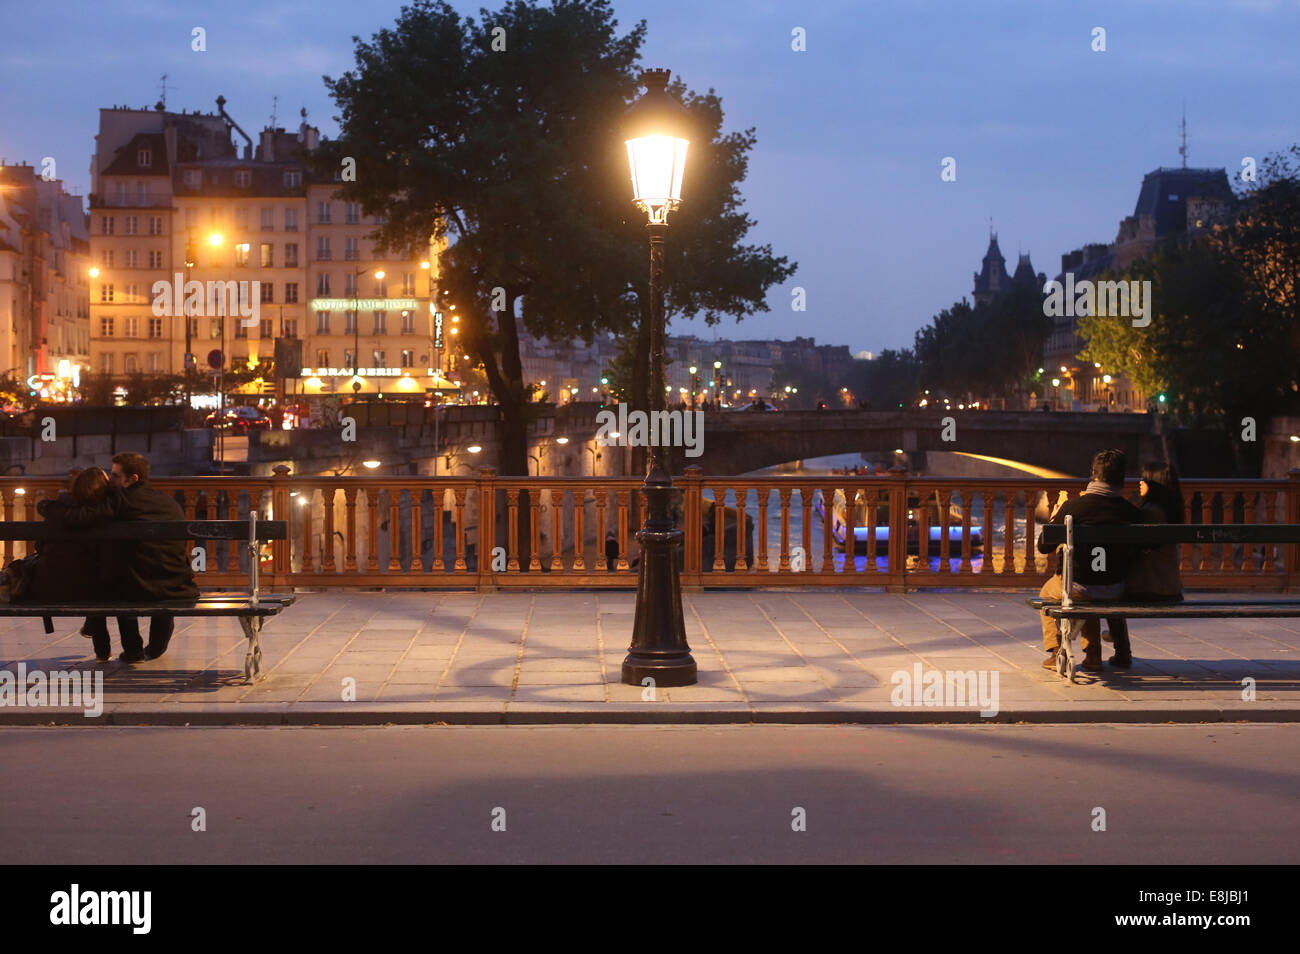 Pont au Double at night. - Stock Image